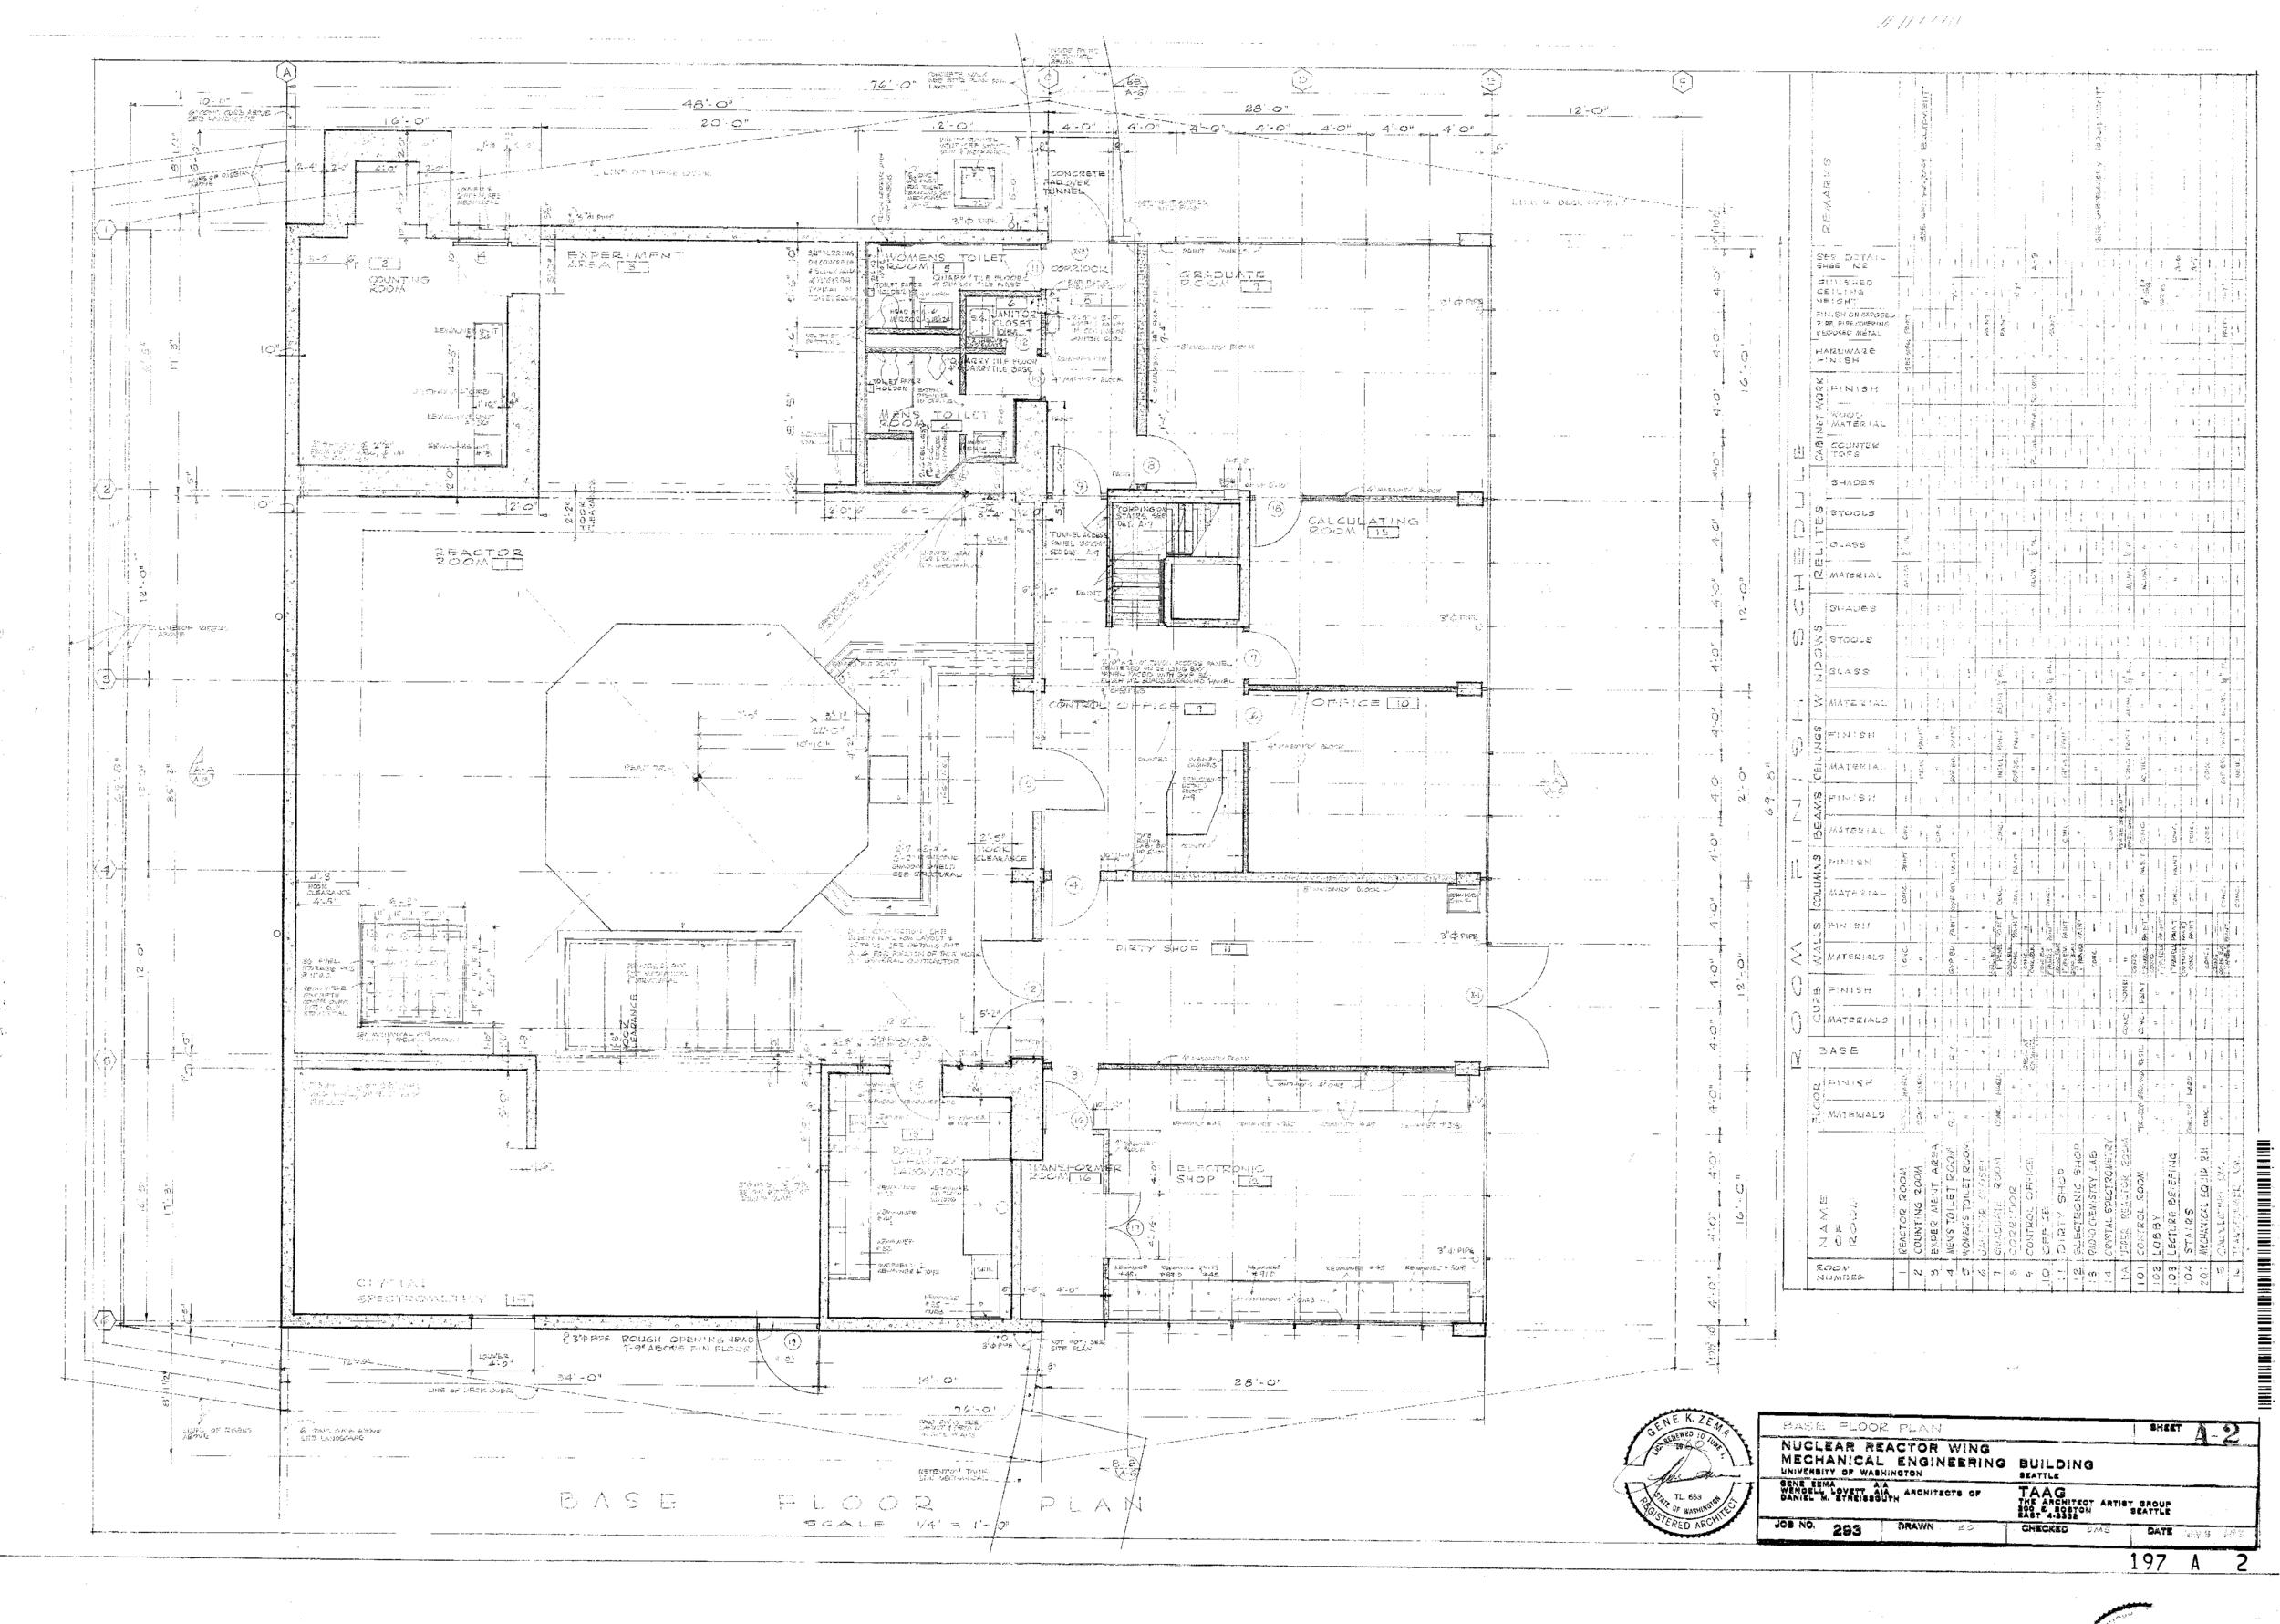 Nuclear Reactor Building - Base Floor Plan